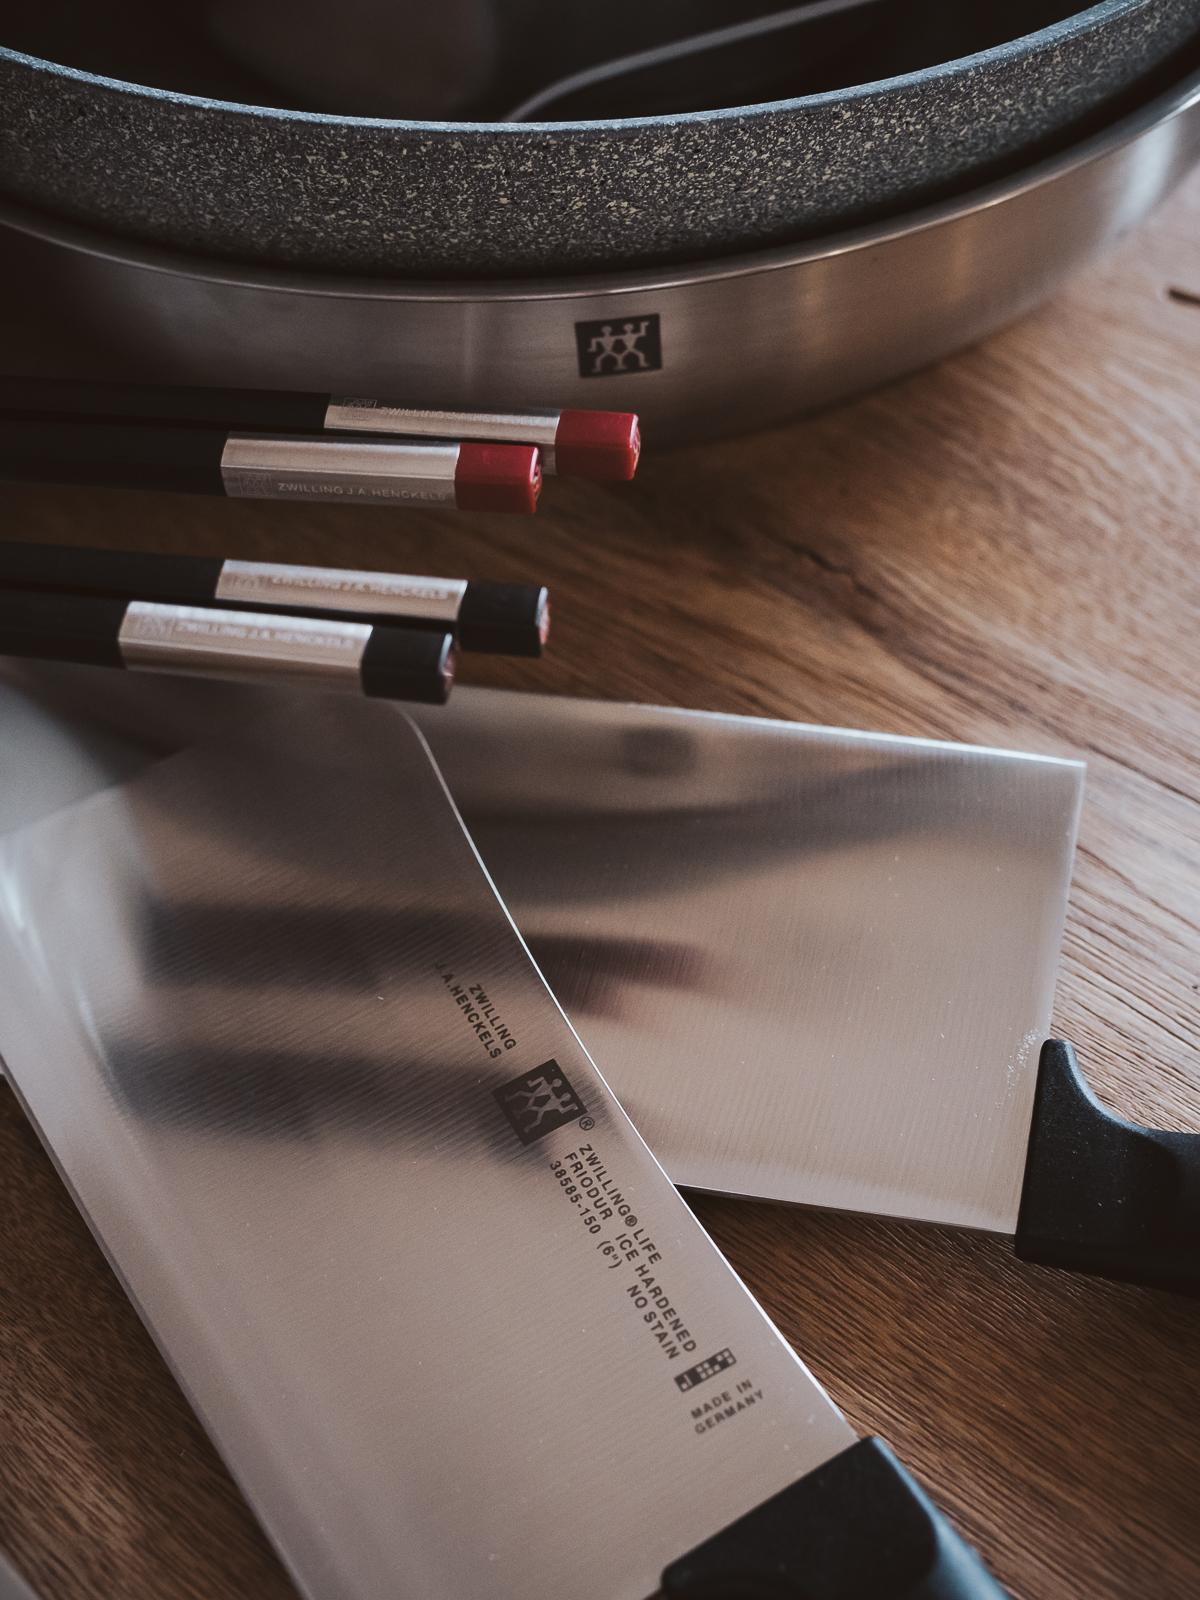 Ingolstadt Village Chinese New Year Lifestyle Shopping & Home Cooking - Olympus EM1Markii 2512 - Yes! Please Enjoy by Fanning Tseng-89.jpg